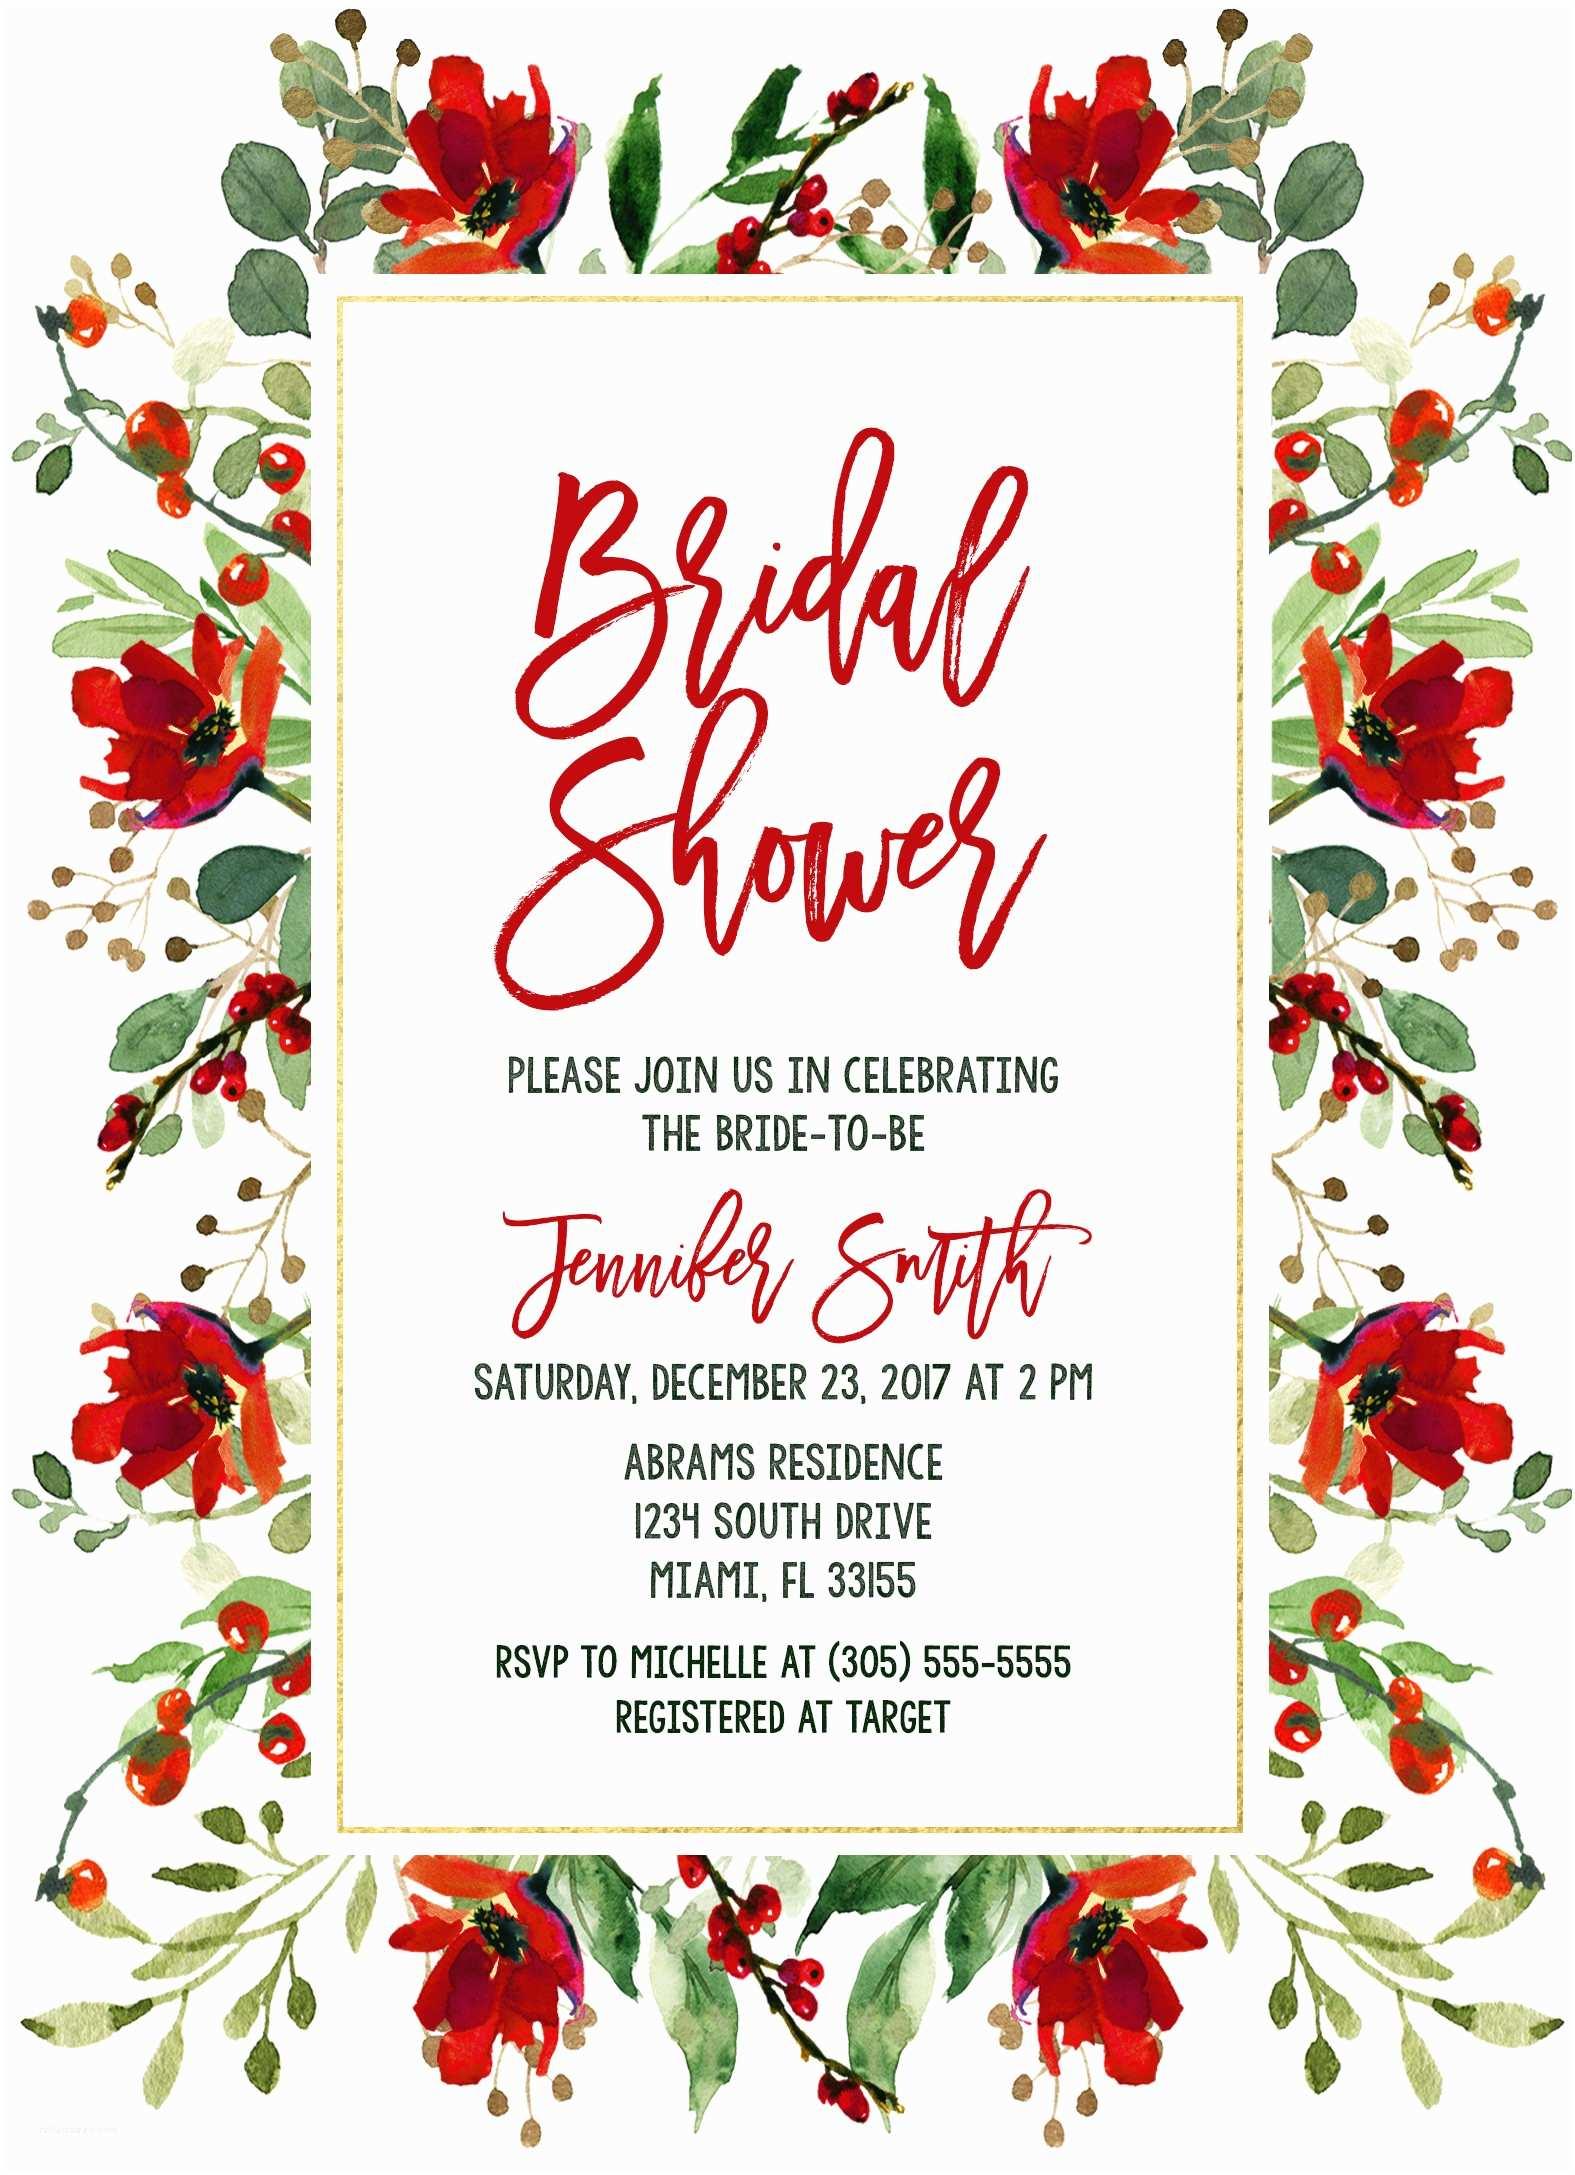 Floral Bridal Shower Invitations Christmas Bridal Shower Invitation Holly Bridal Shower